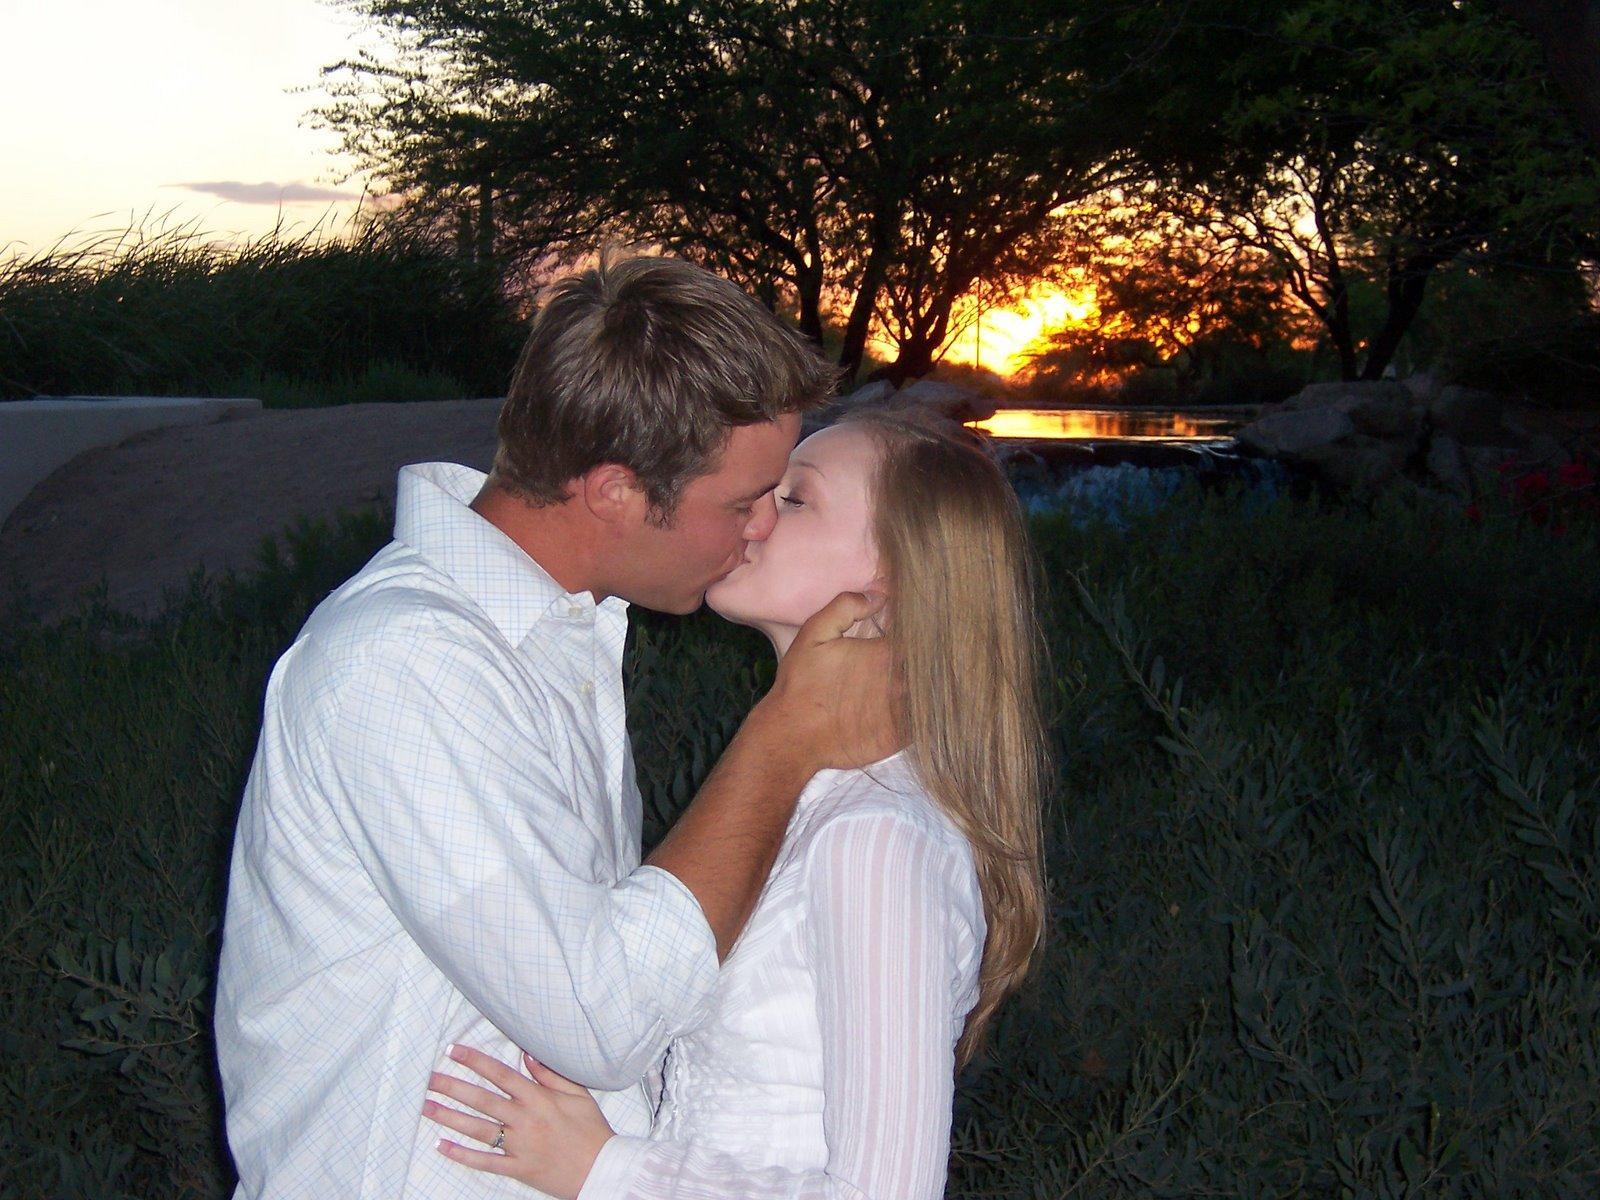 Awww kisses